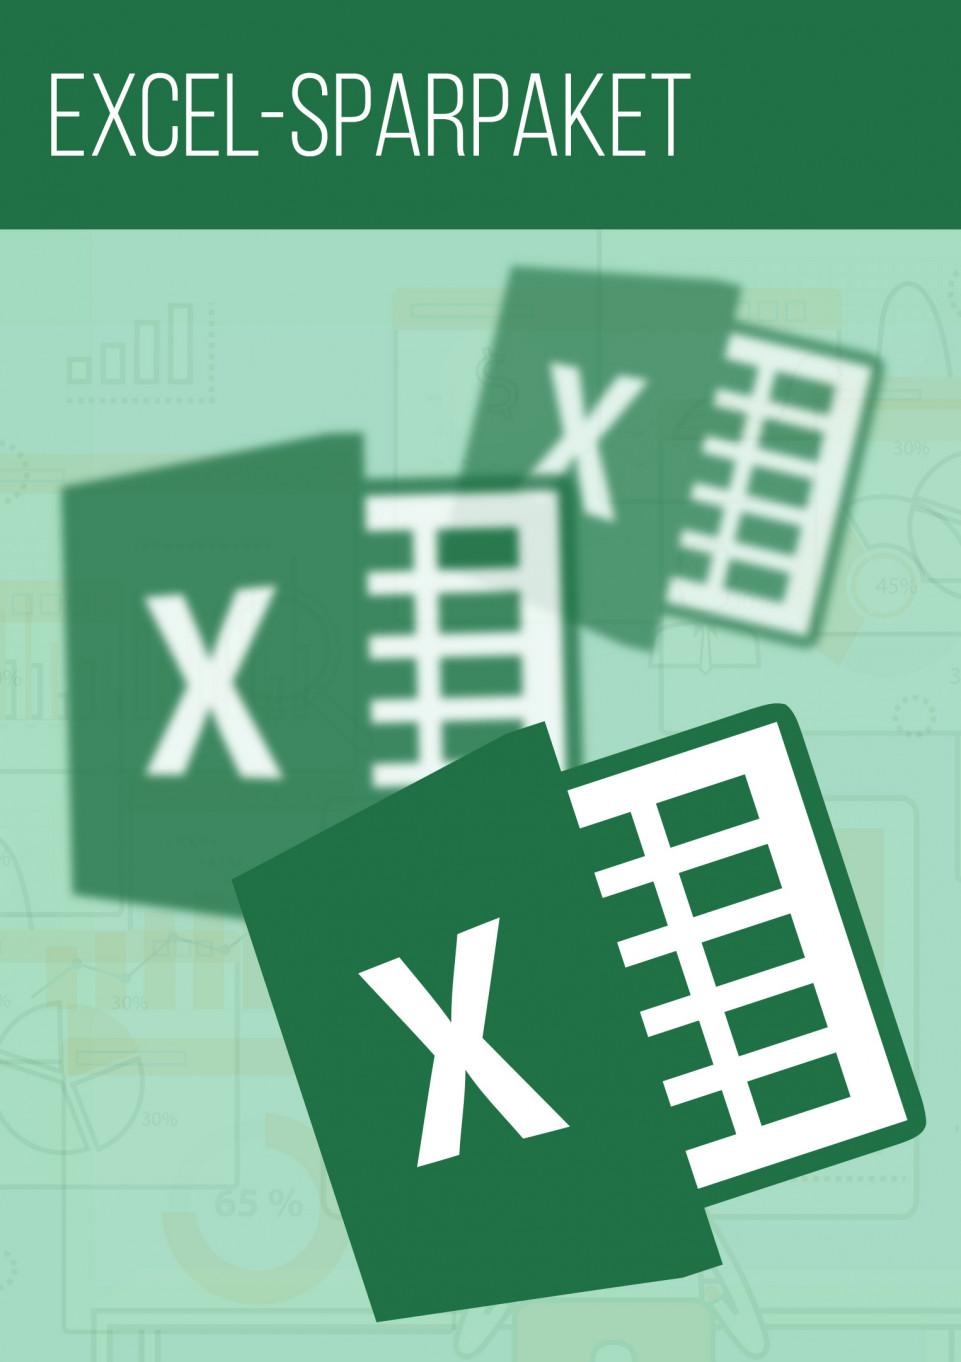 Microsoft Excel-Tutorials im Sparpaket